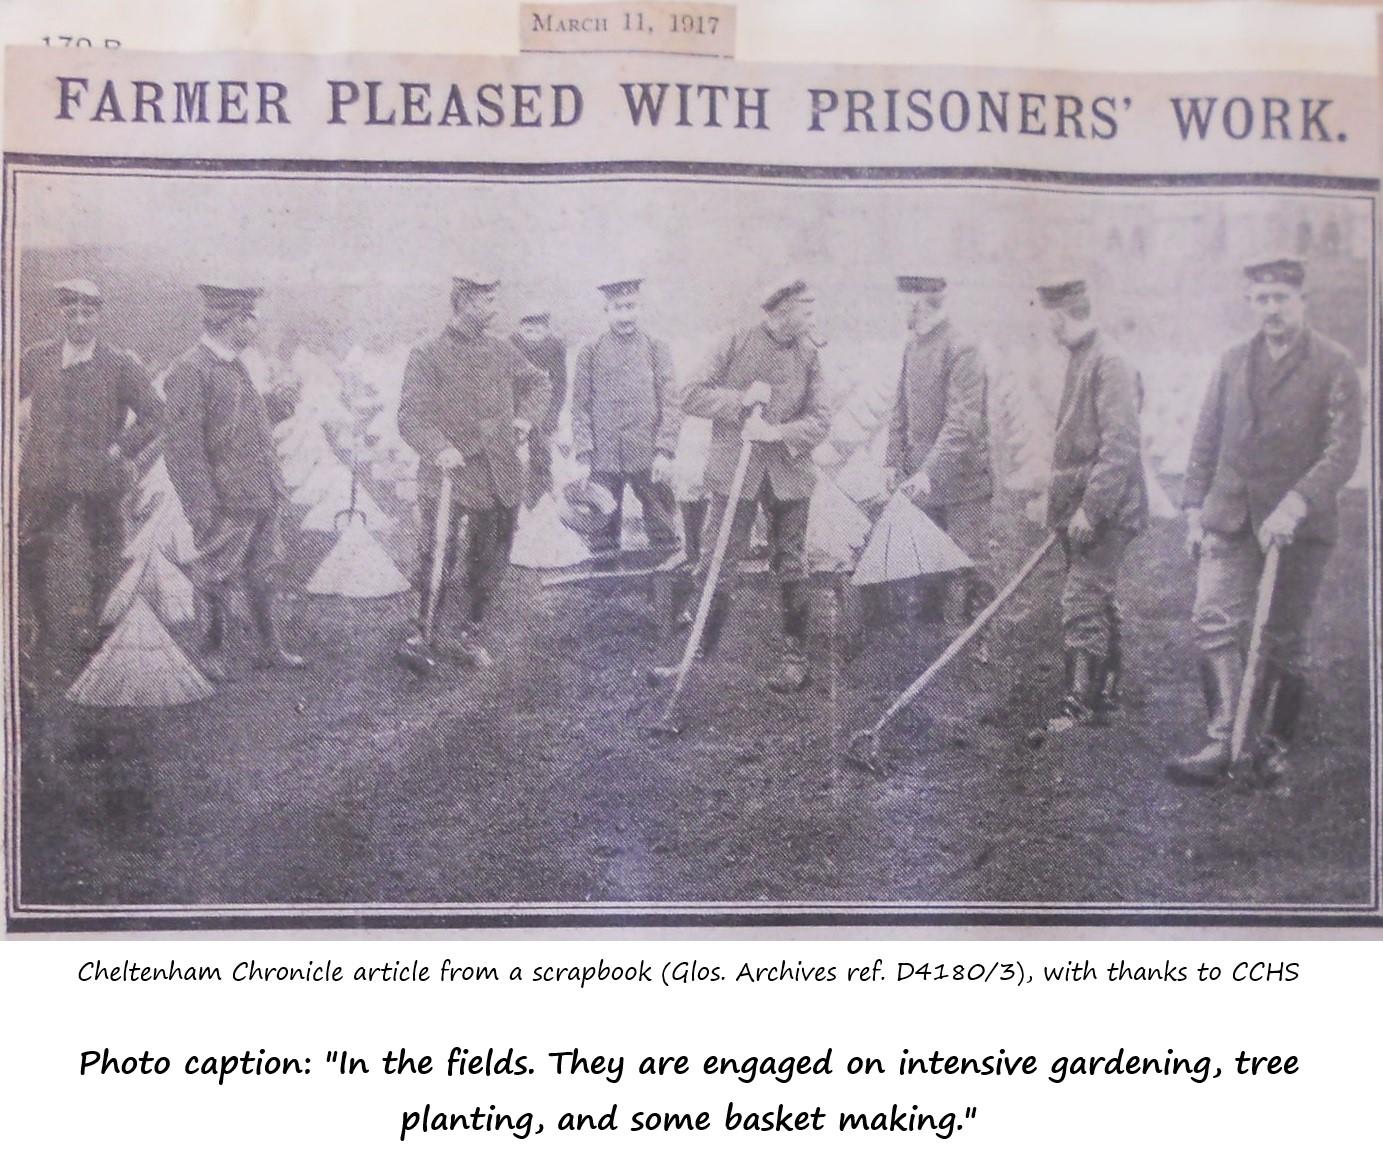 1917 news photo of POWs at work